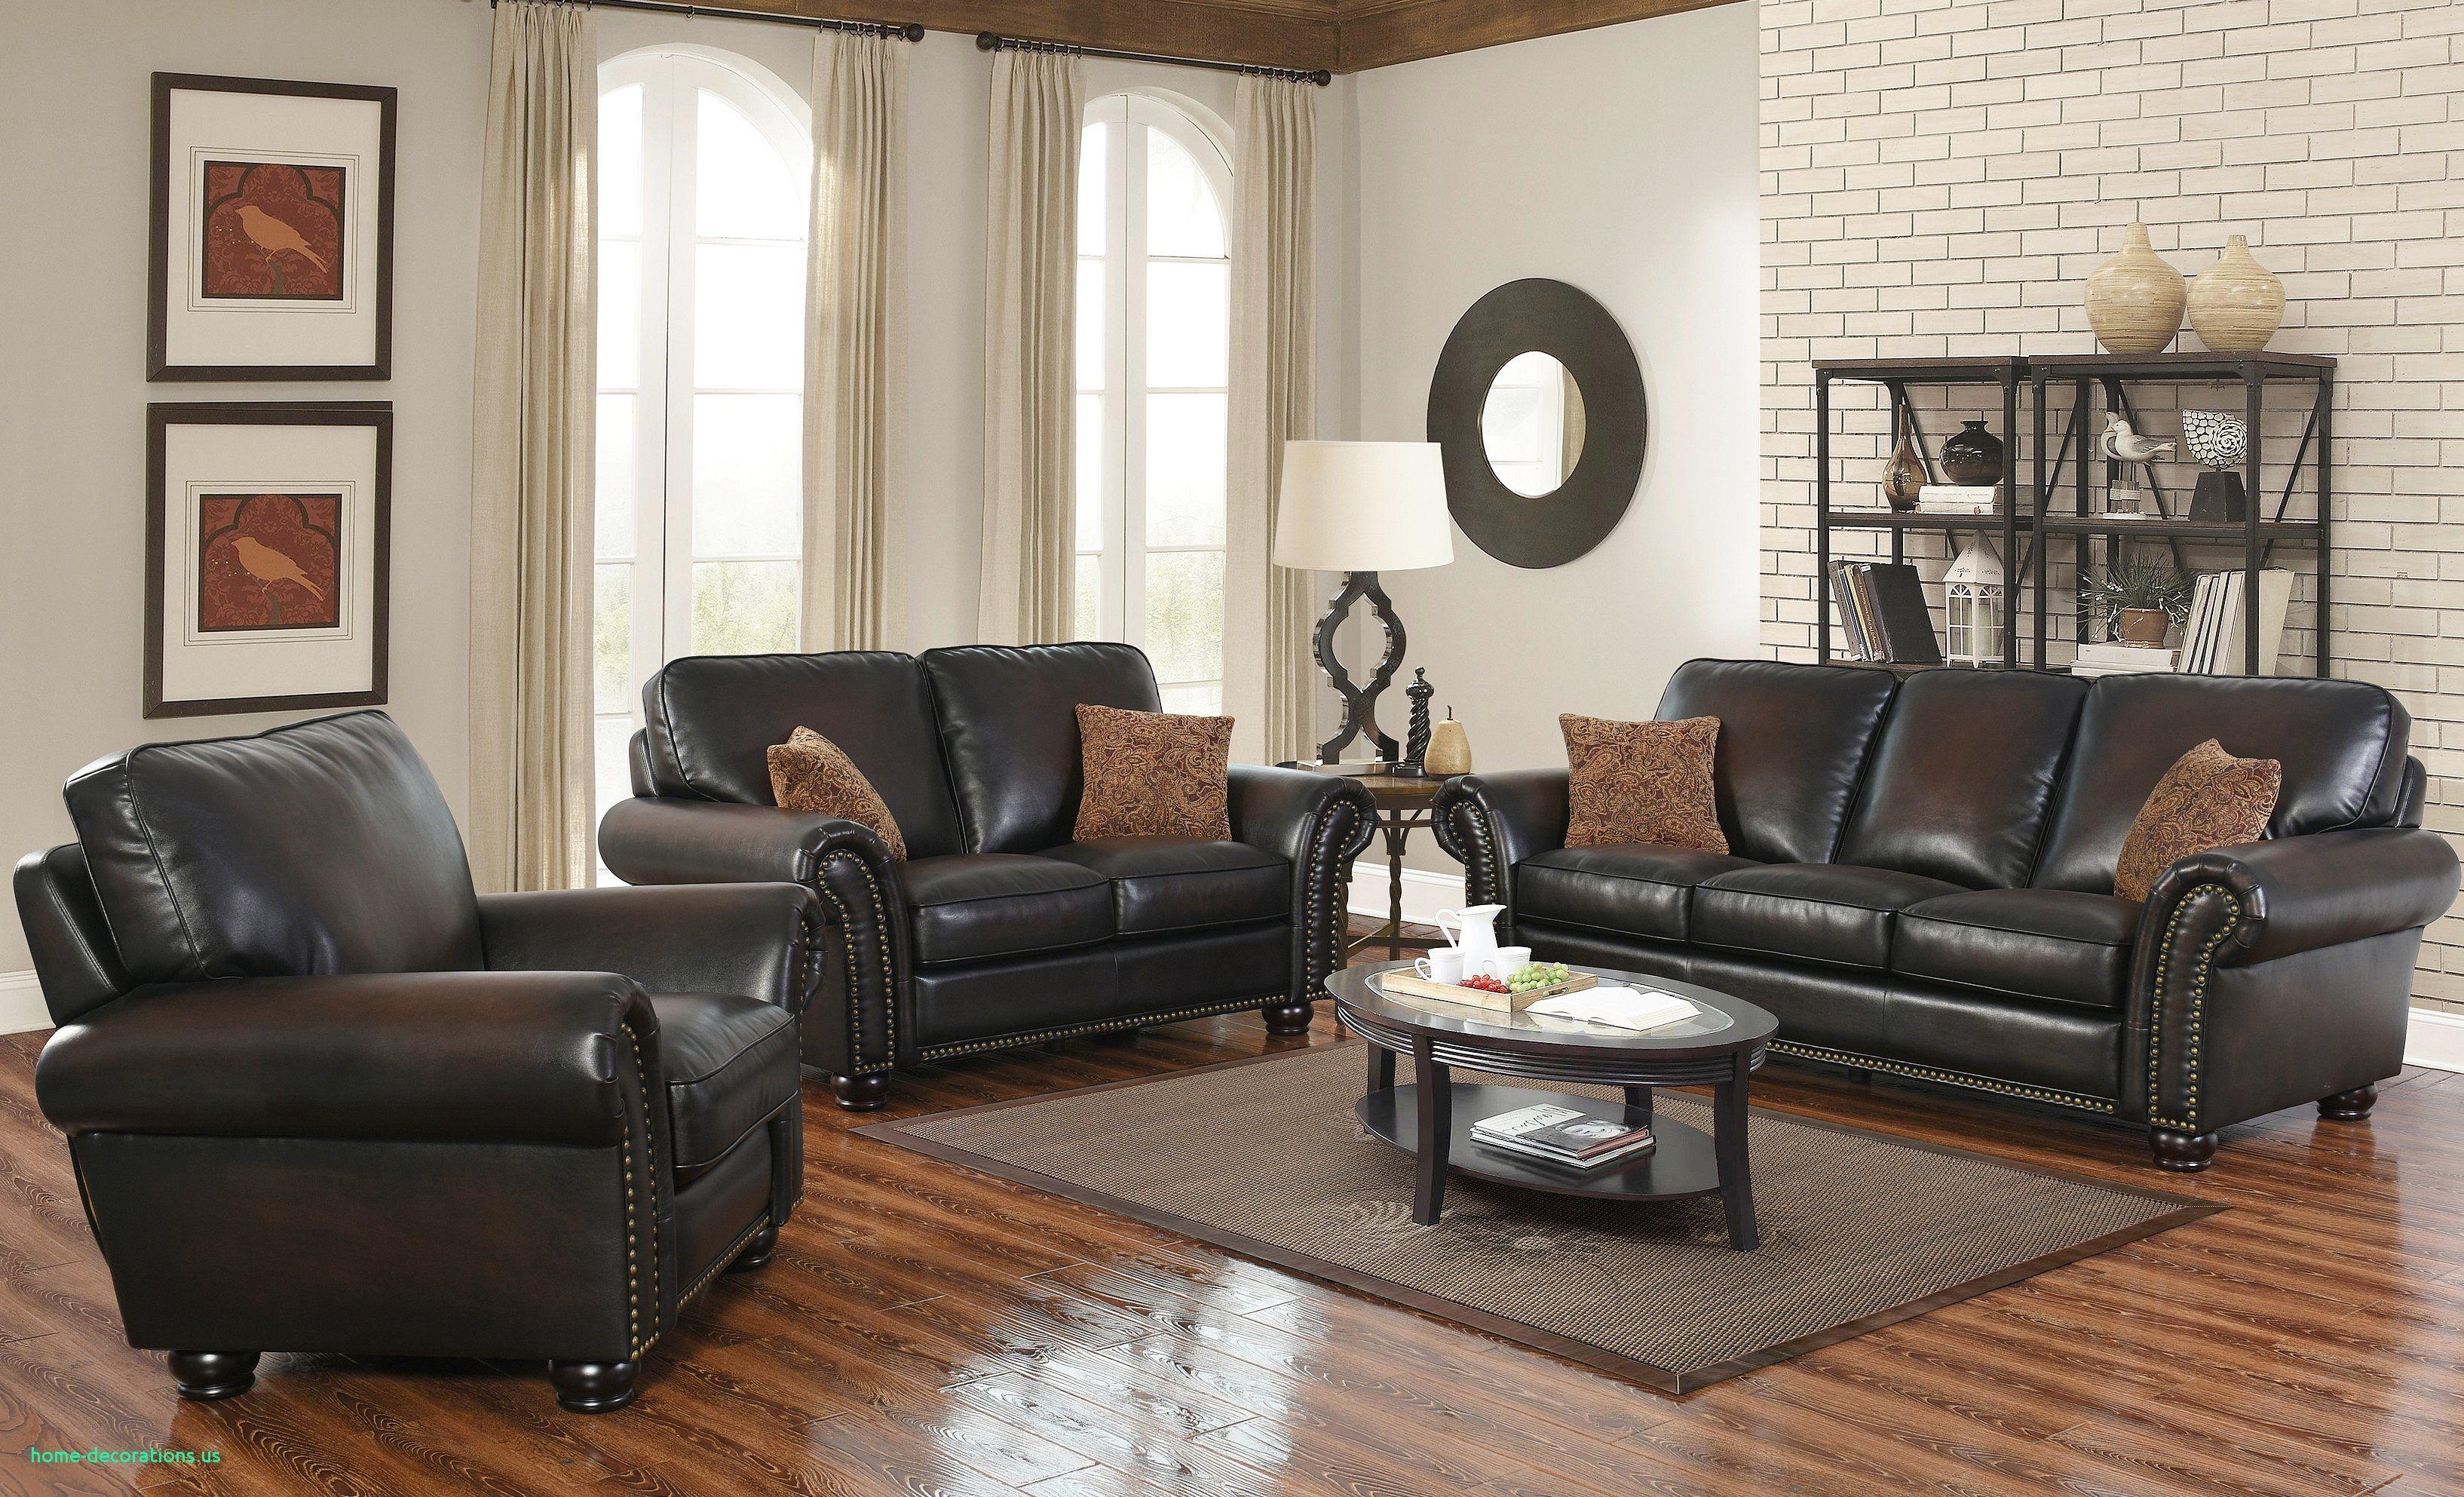 New Home Source Furniture Nj